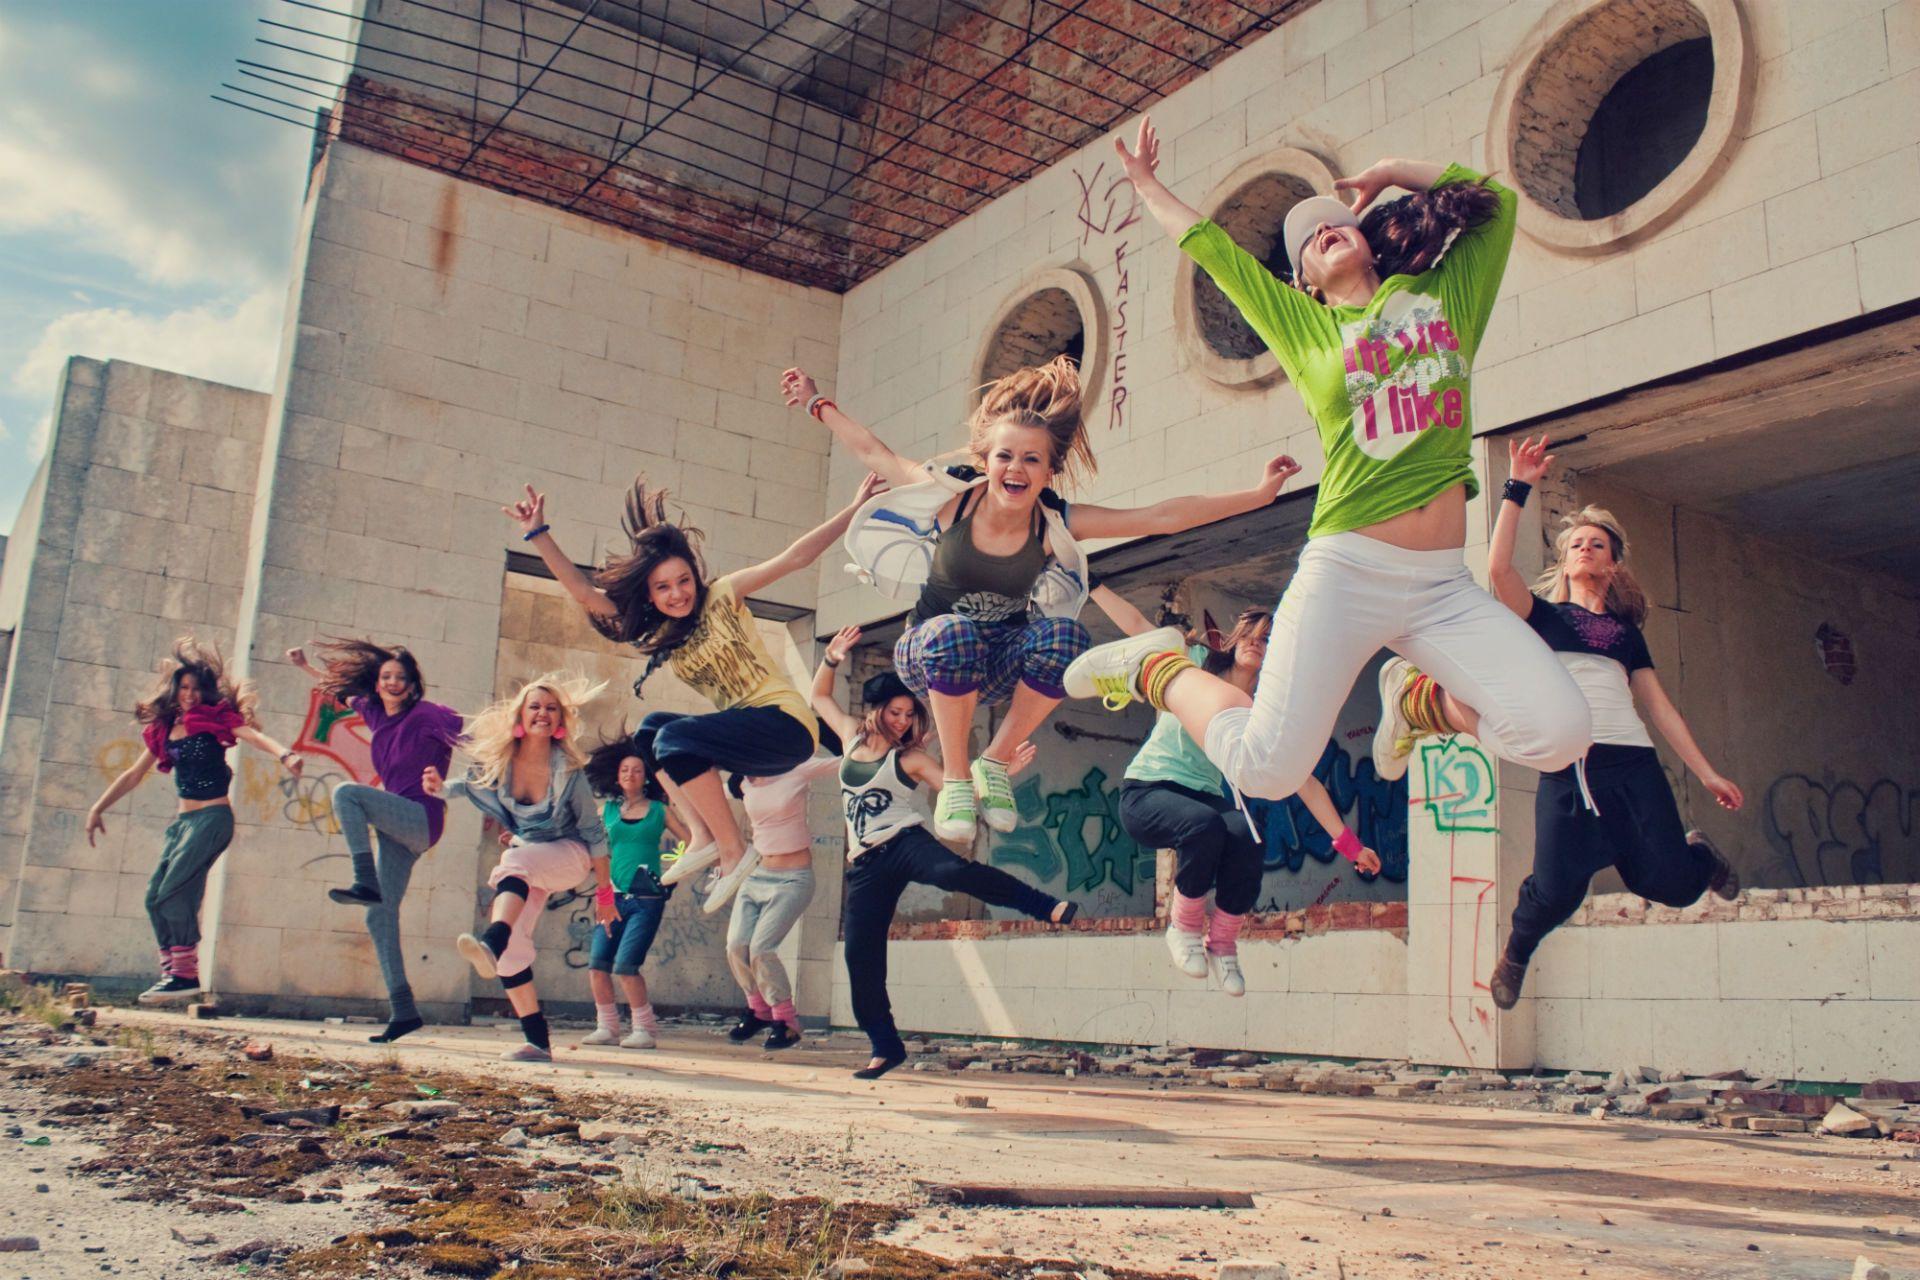 танец креативное dance creative  № 3510403 бесплатно